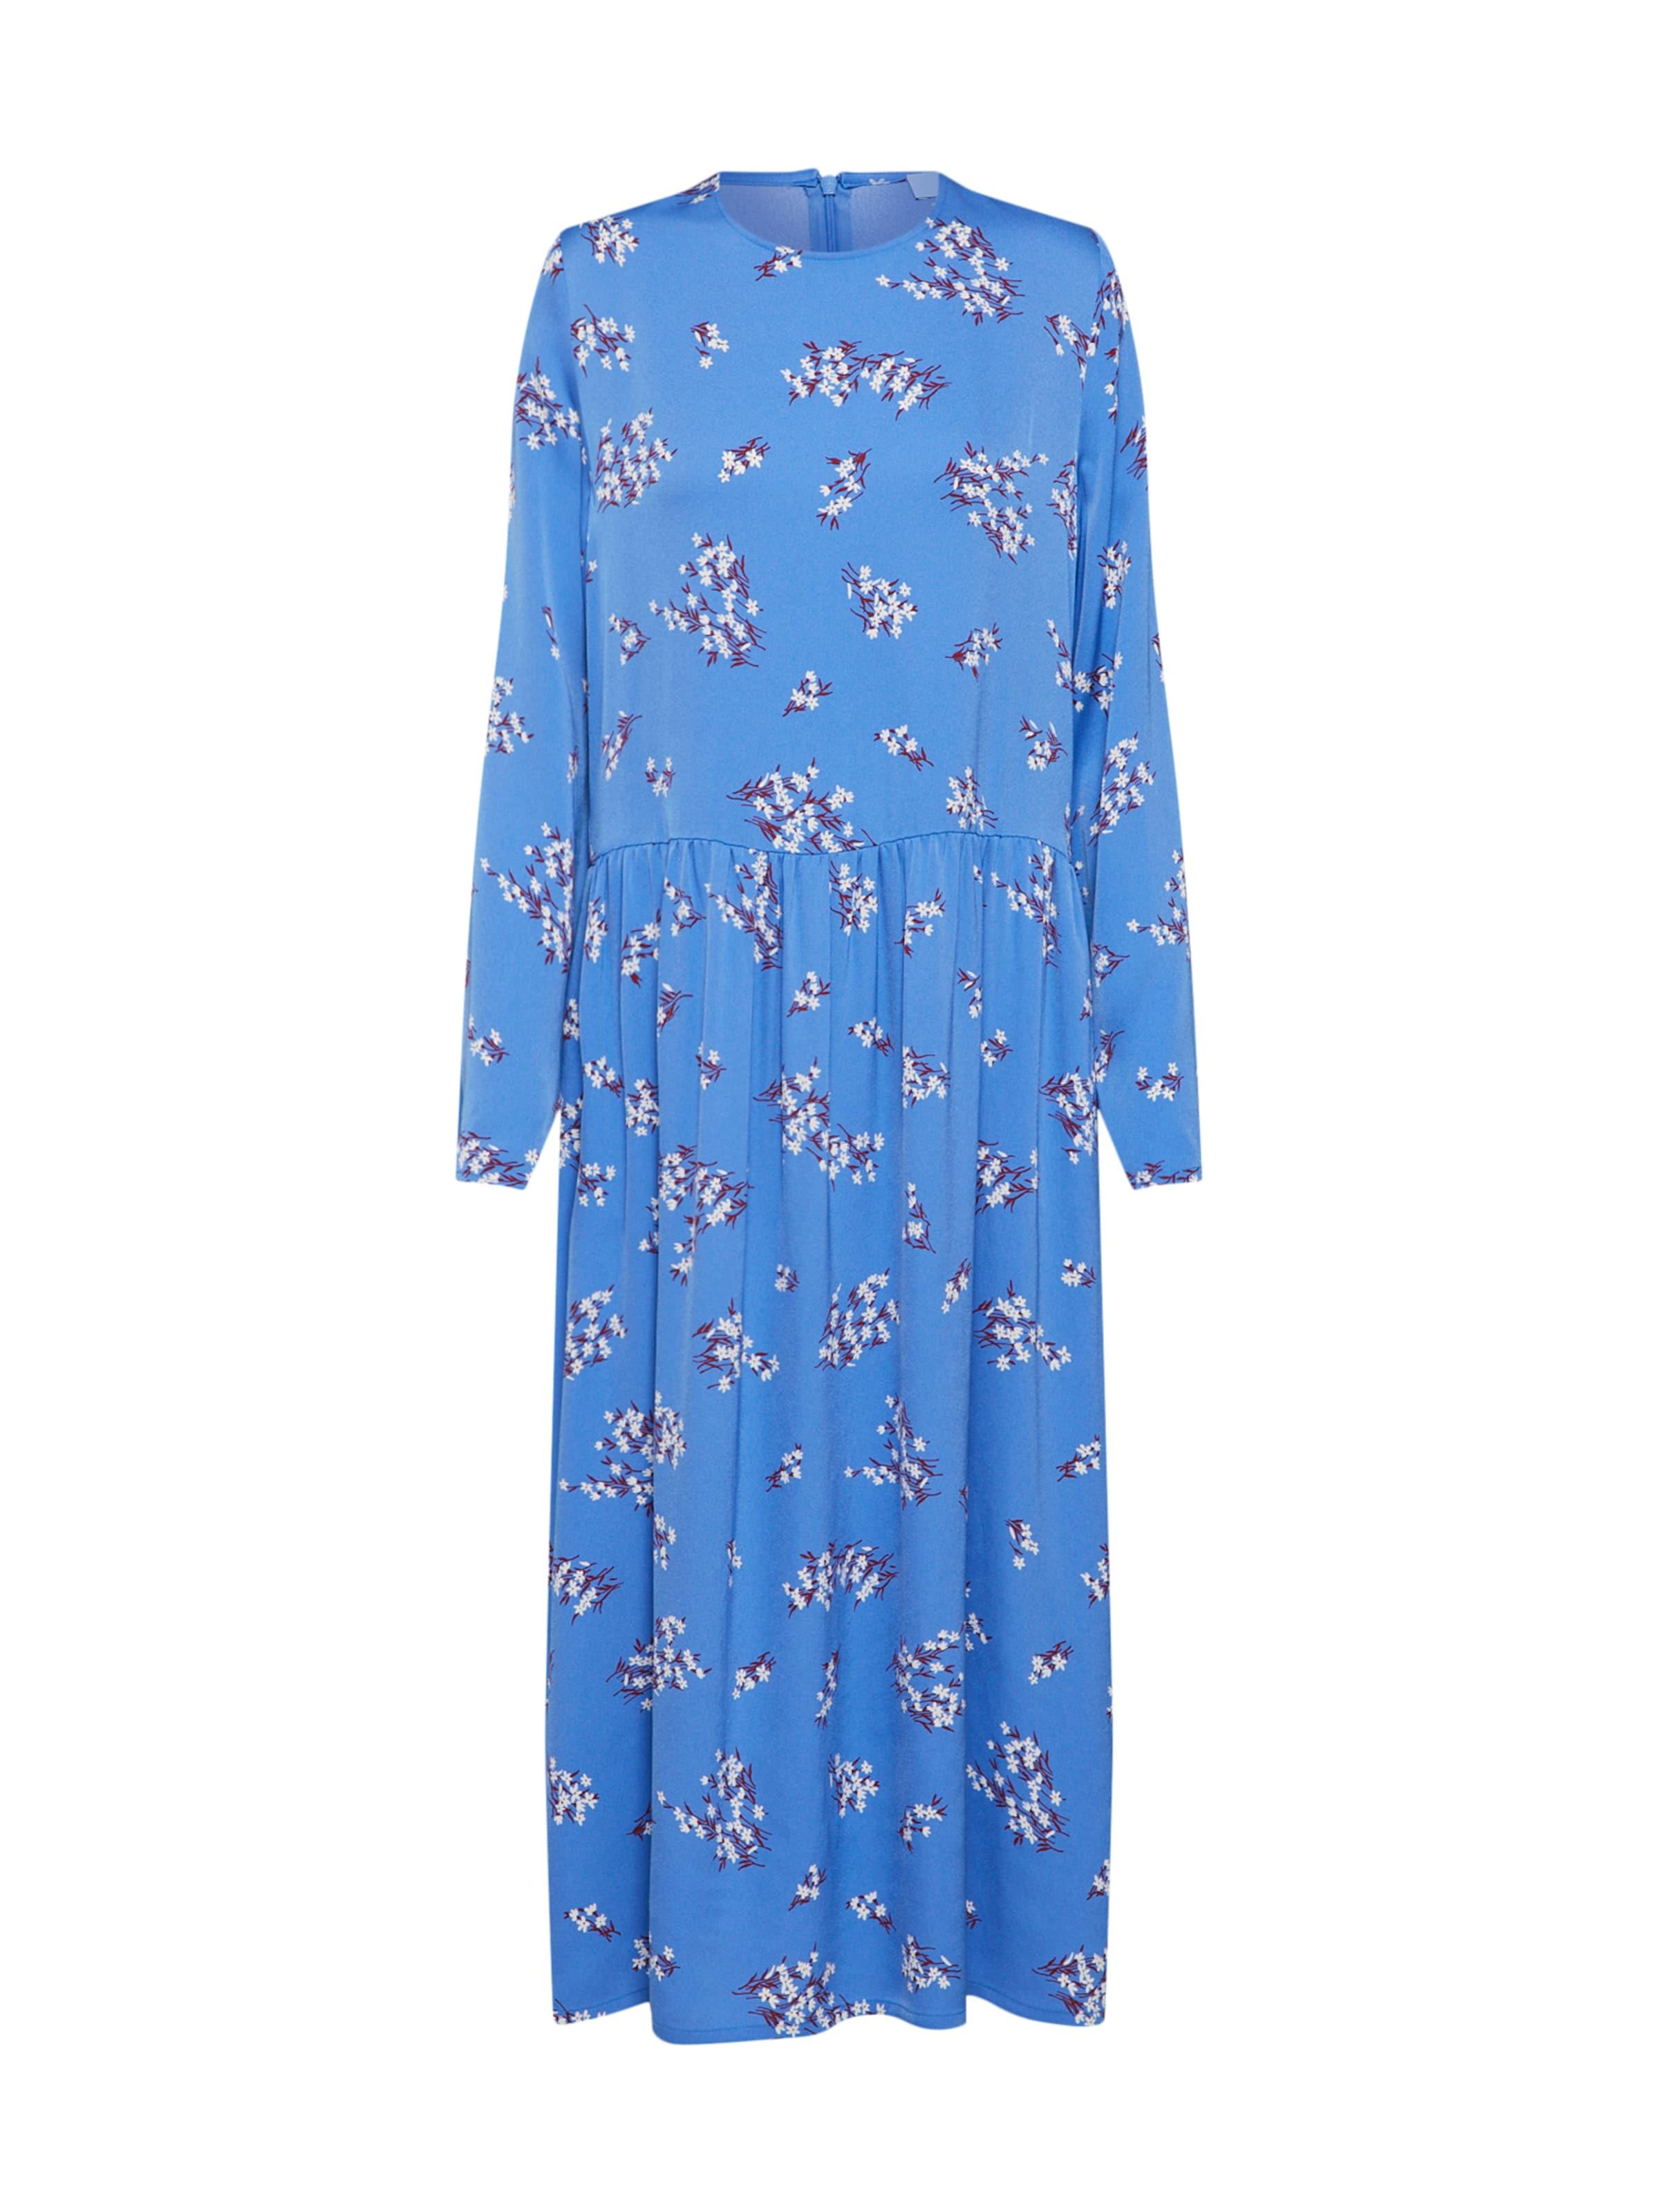 Dress Samsoeamp; 'rama En Aop' Robe Bleu hQCsrtdx